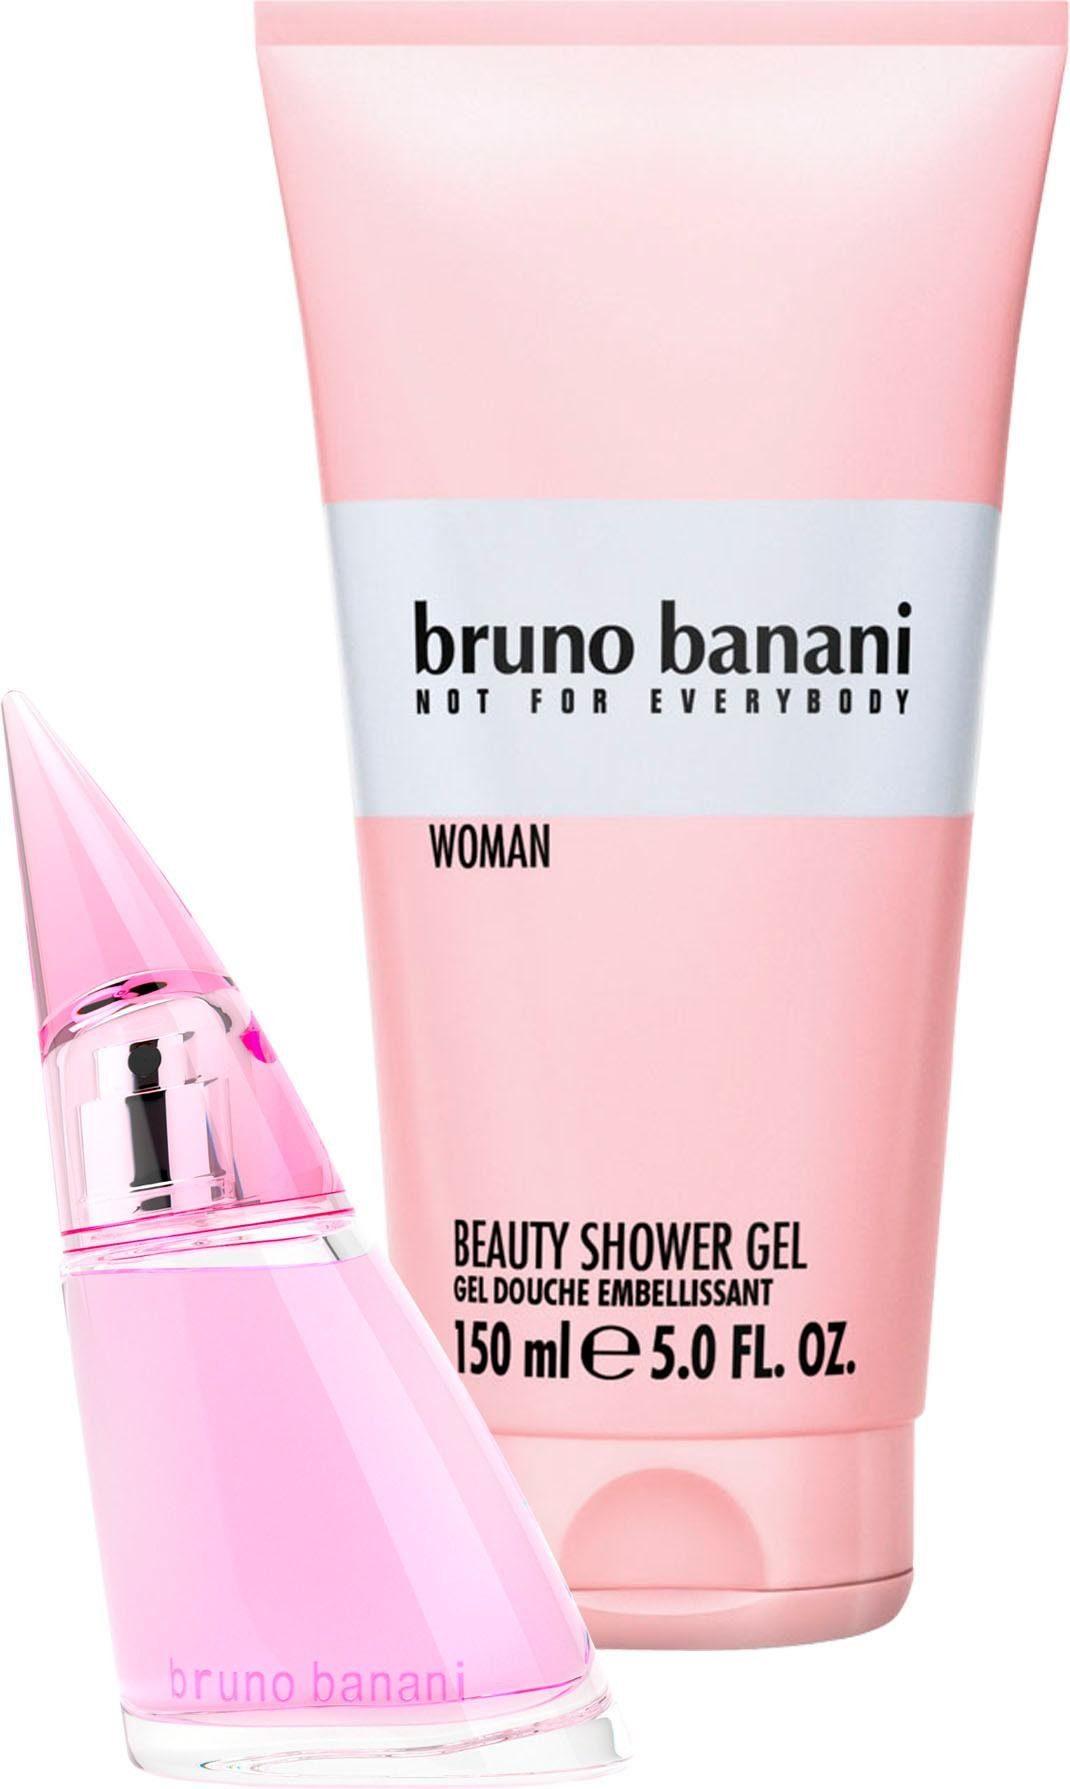 PUMA Duft Set »Jam Women«, 3 tlg., Das Set beinhaltet: Eau de Toilette, Duschgel, Deo Spray online kaufen | OTTO